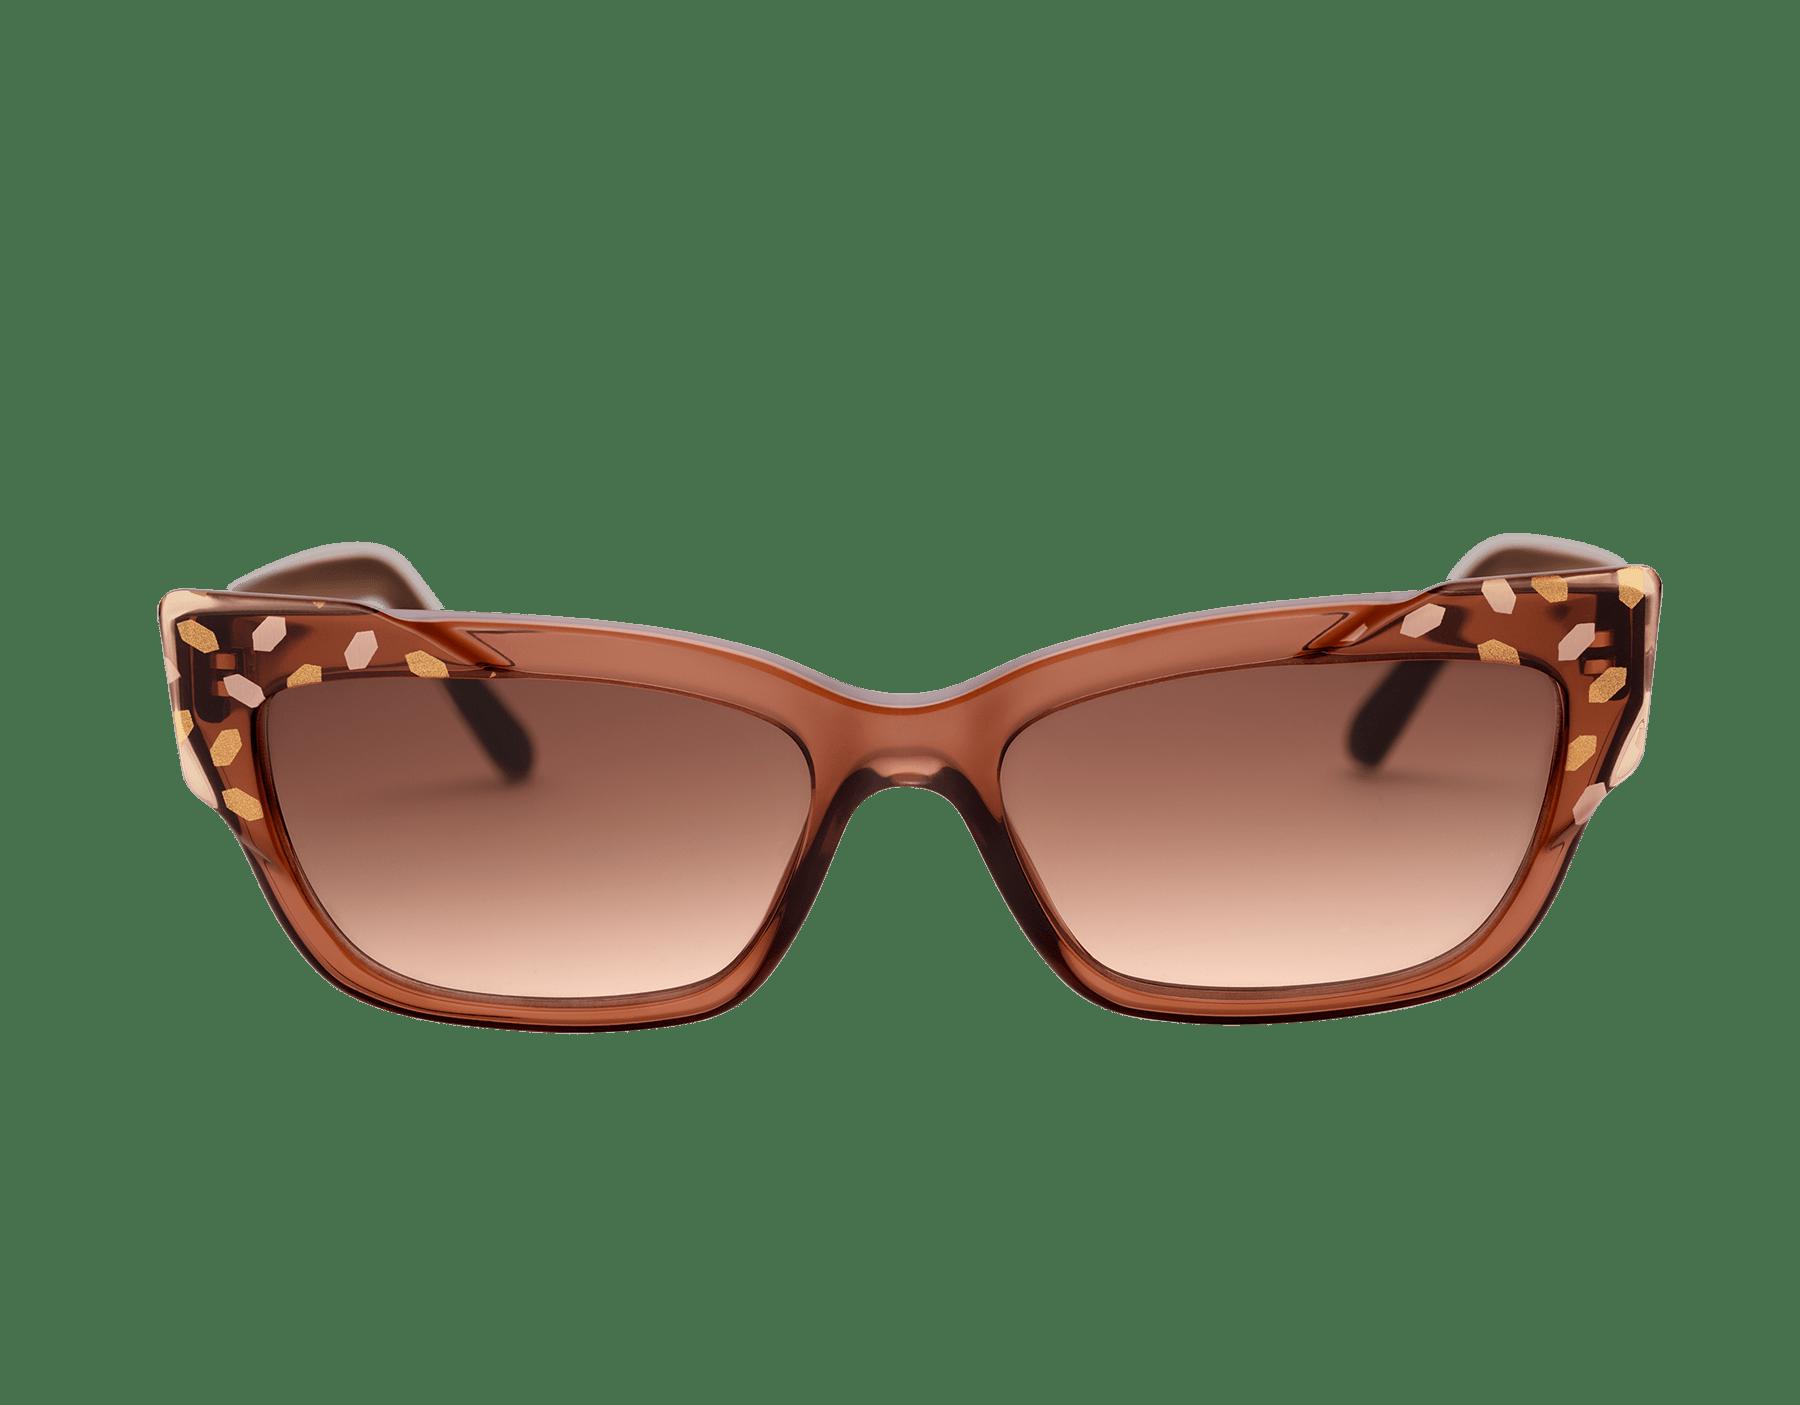 Bvlgari Serpenti Scale-blast rectangular cat-eye acetate sunglasses. 903736 image 2